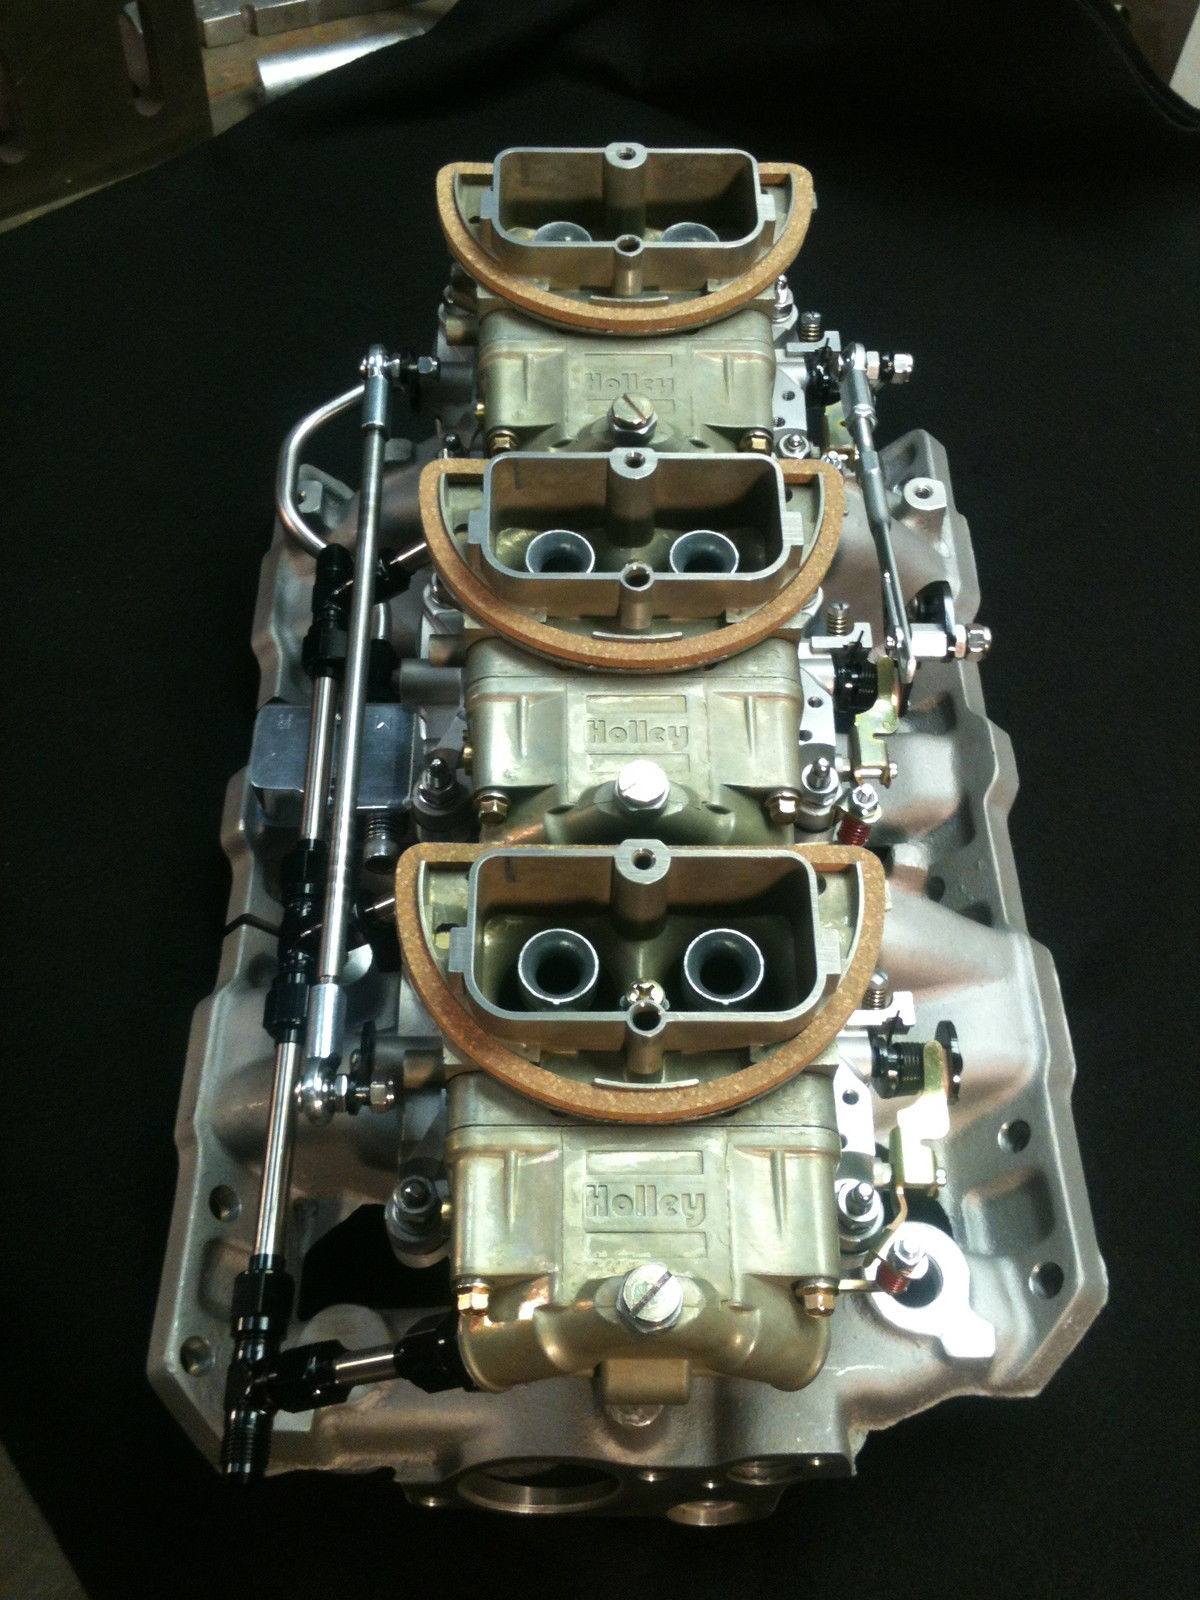 Tri power carbs - Pontiac GTO Forum